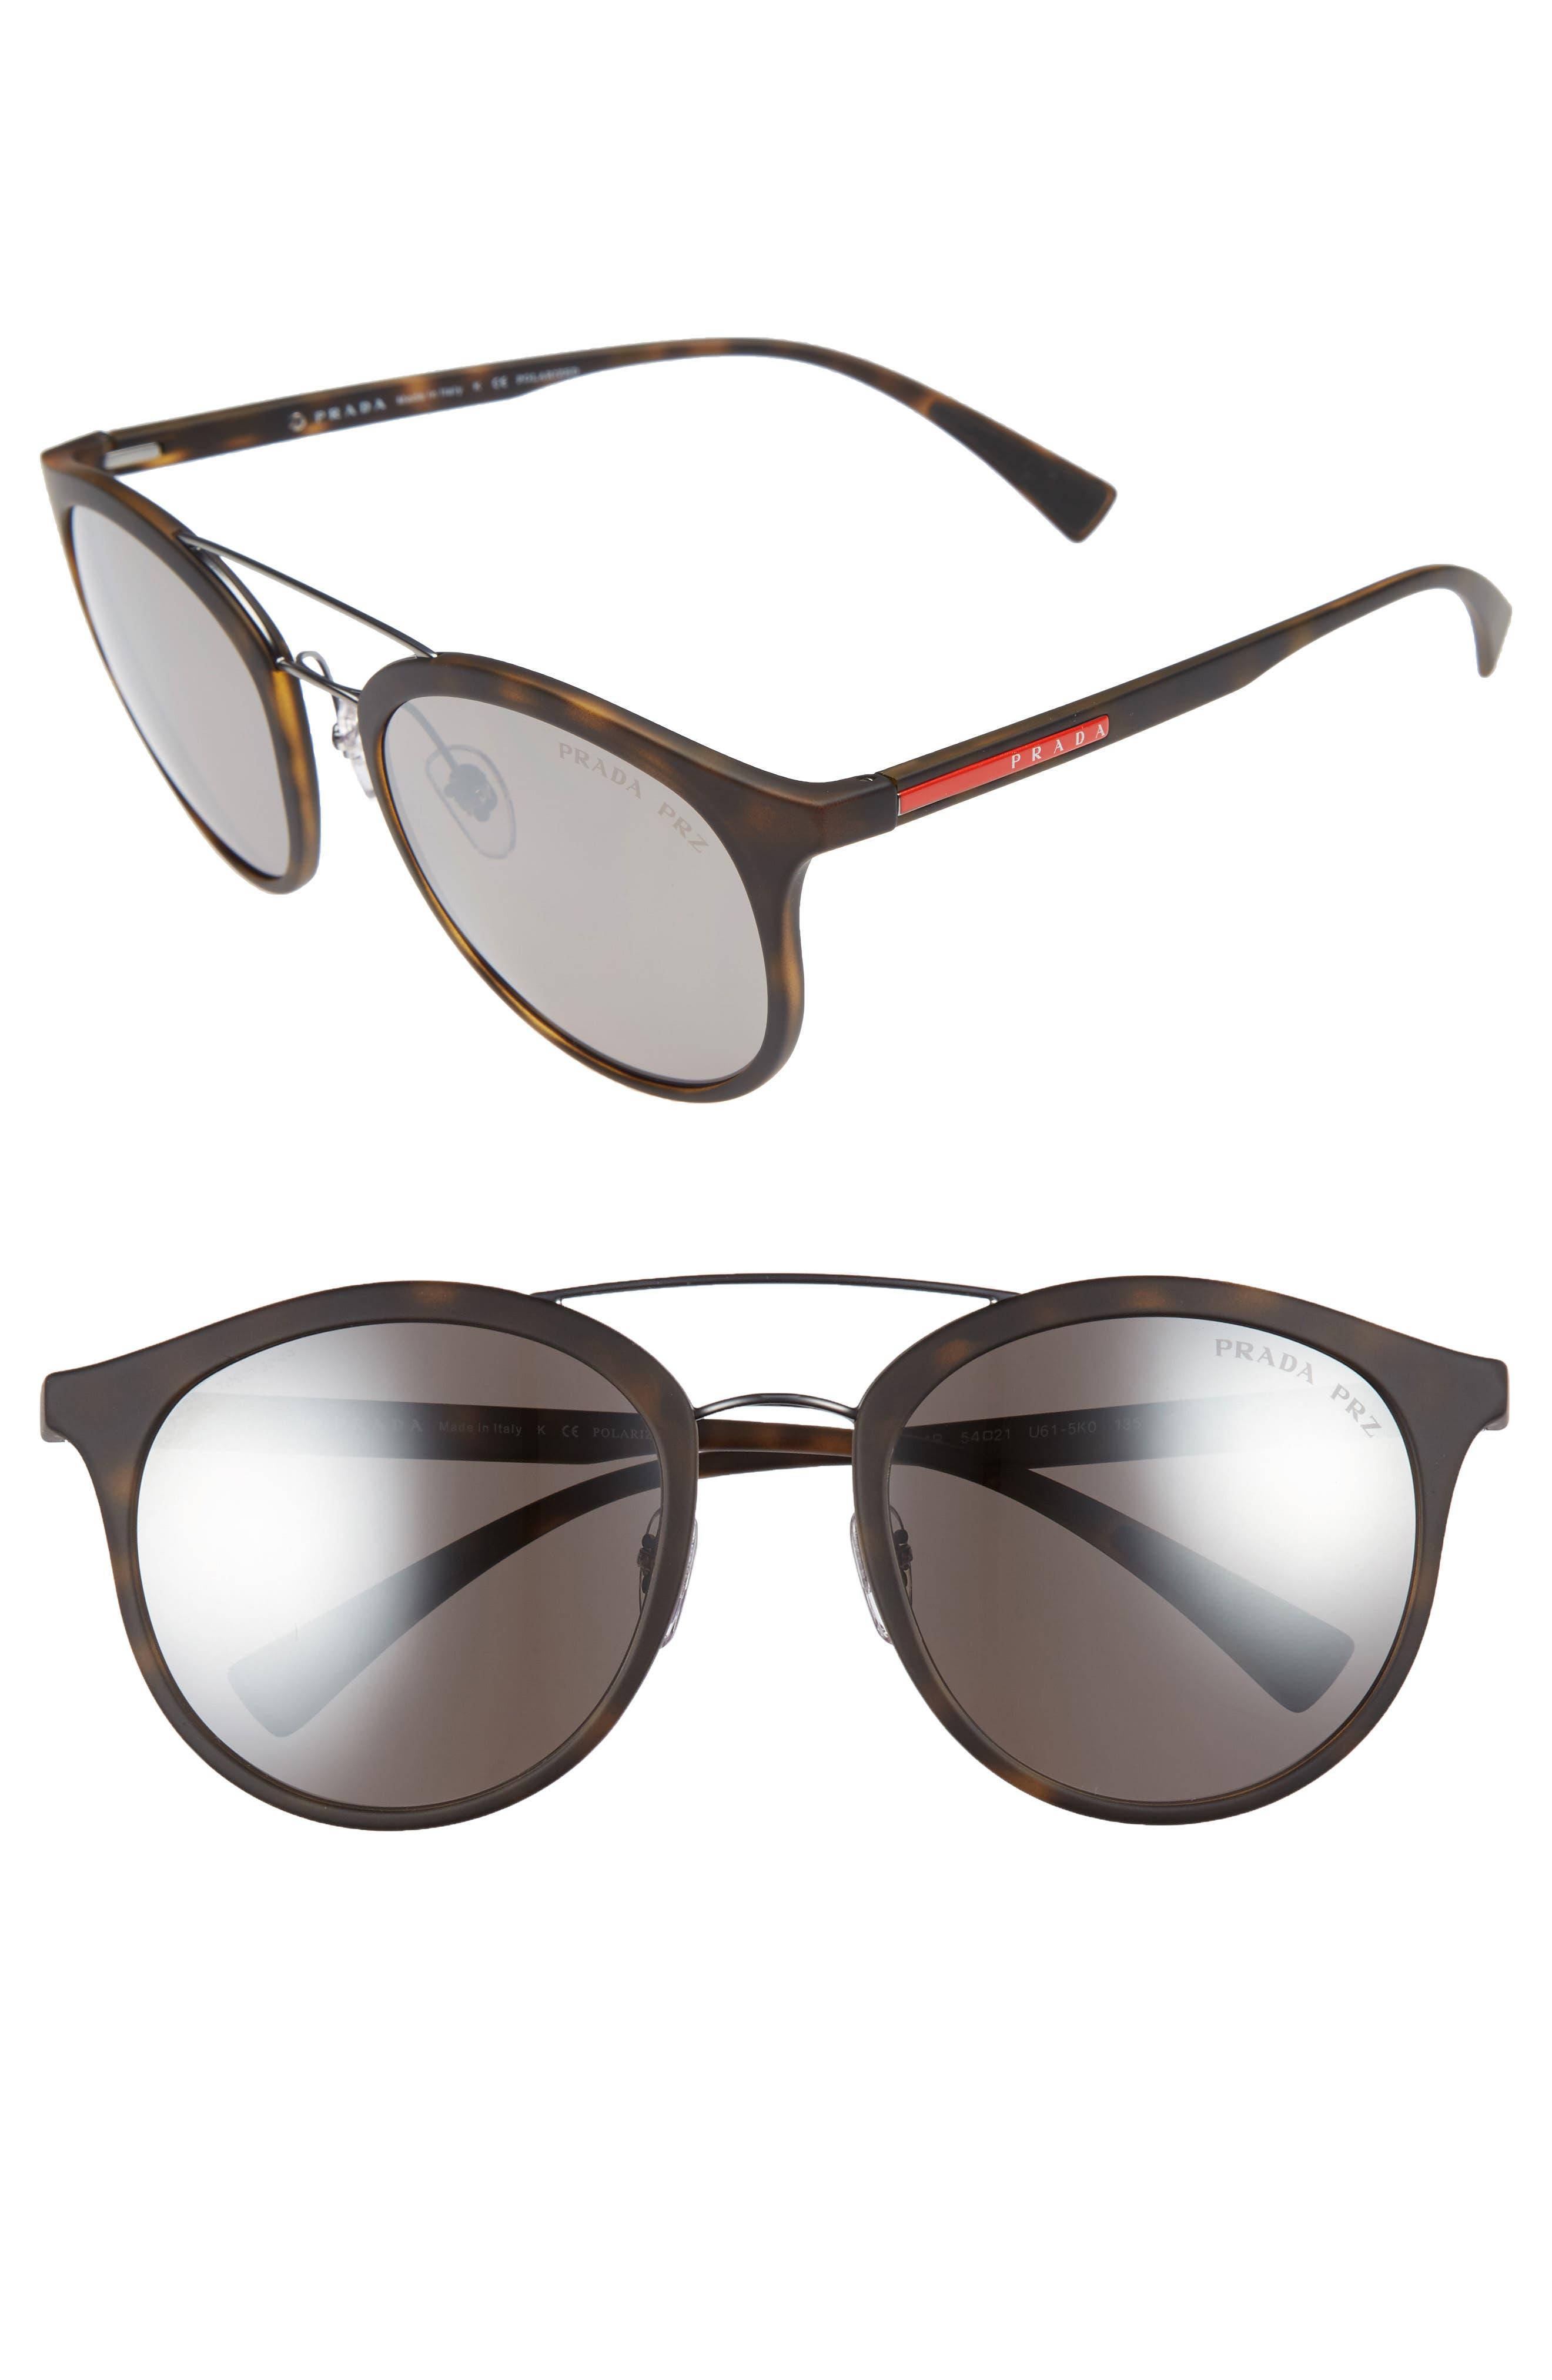 54mm Polarized Round Sunglasses,                             Main thumbnail 1, color,                             Havana